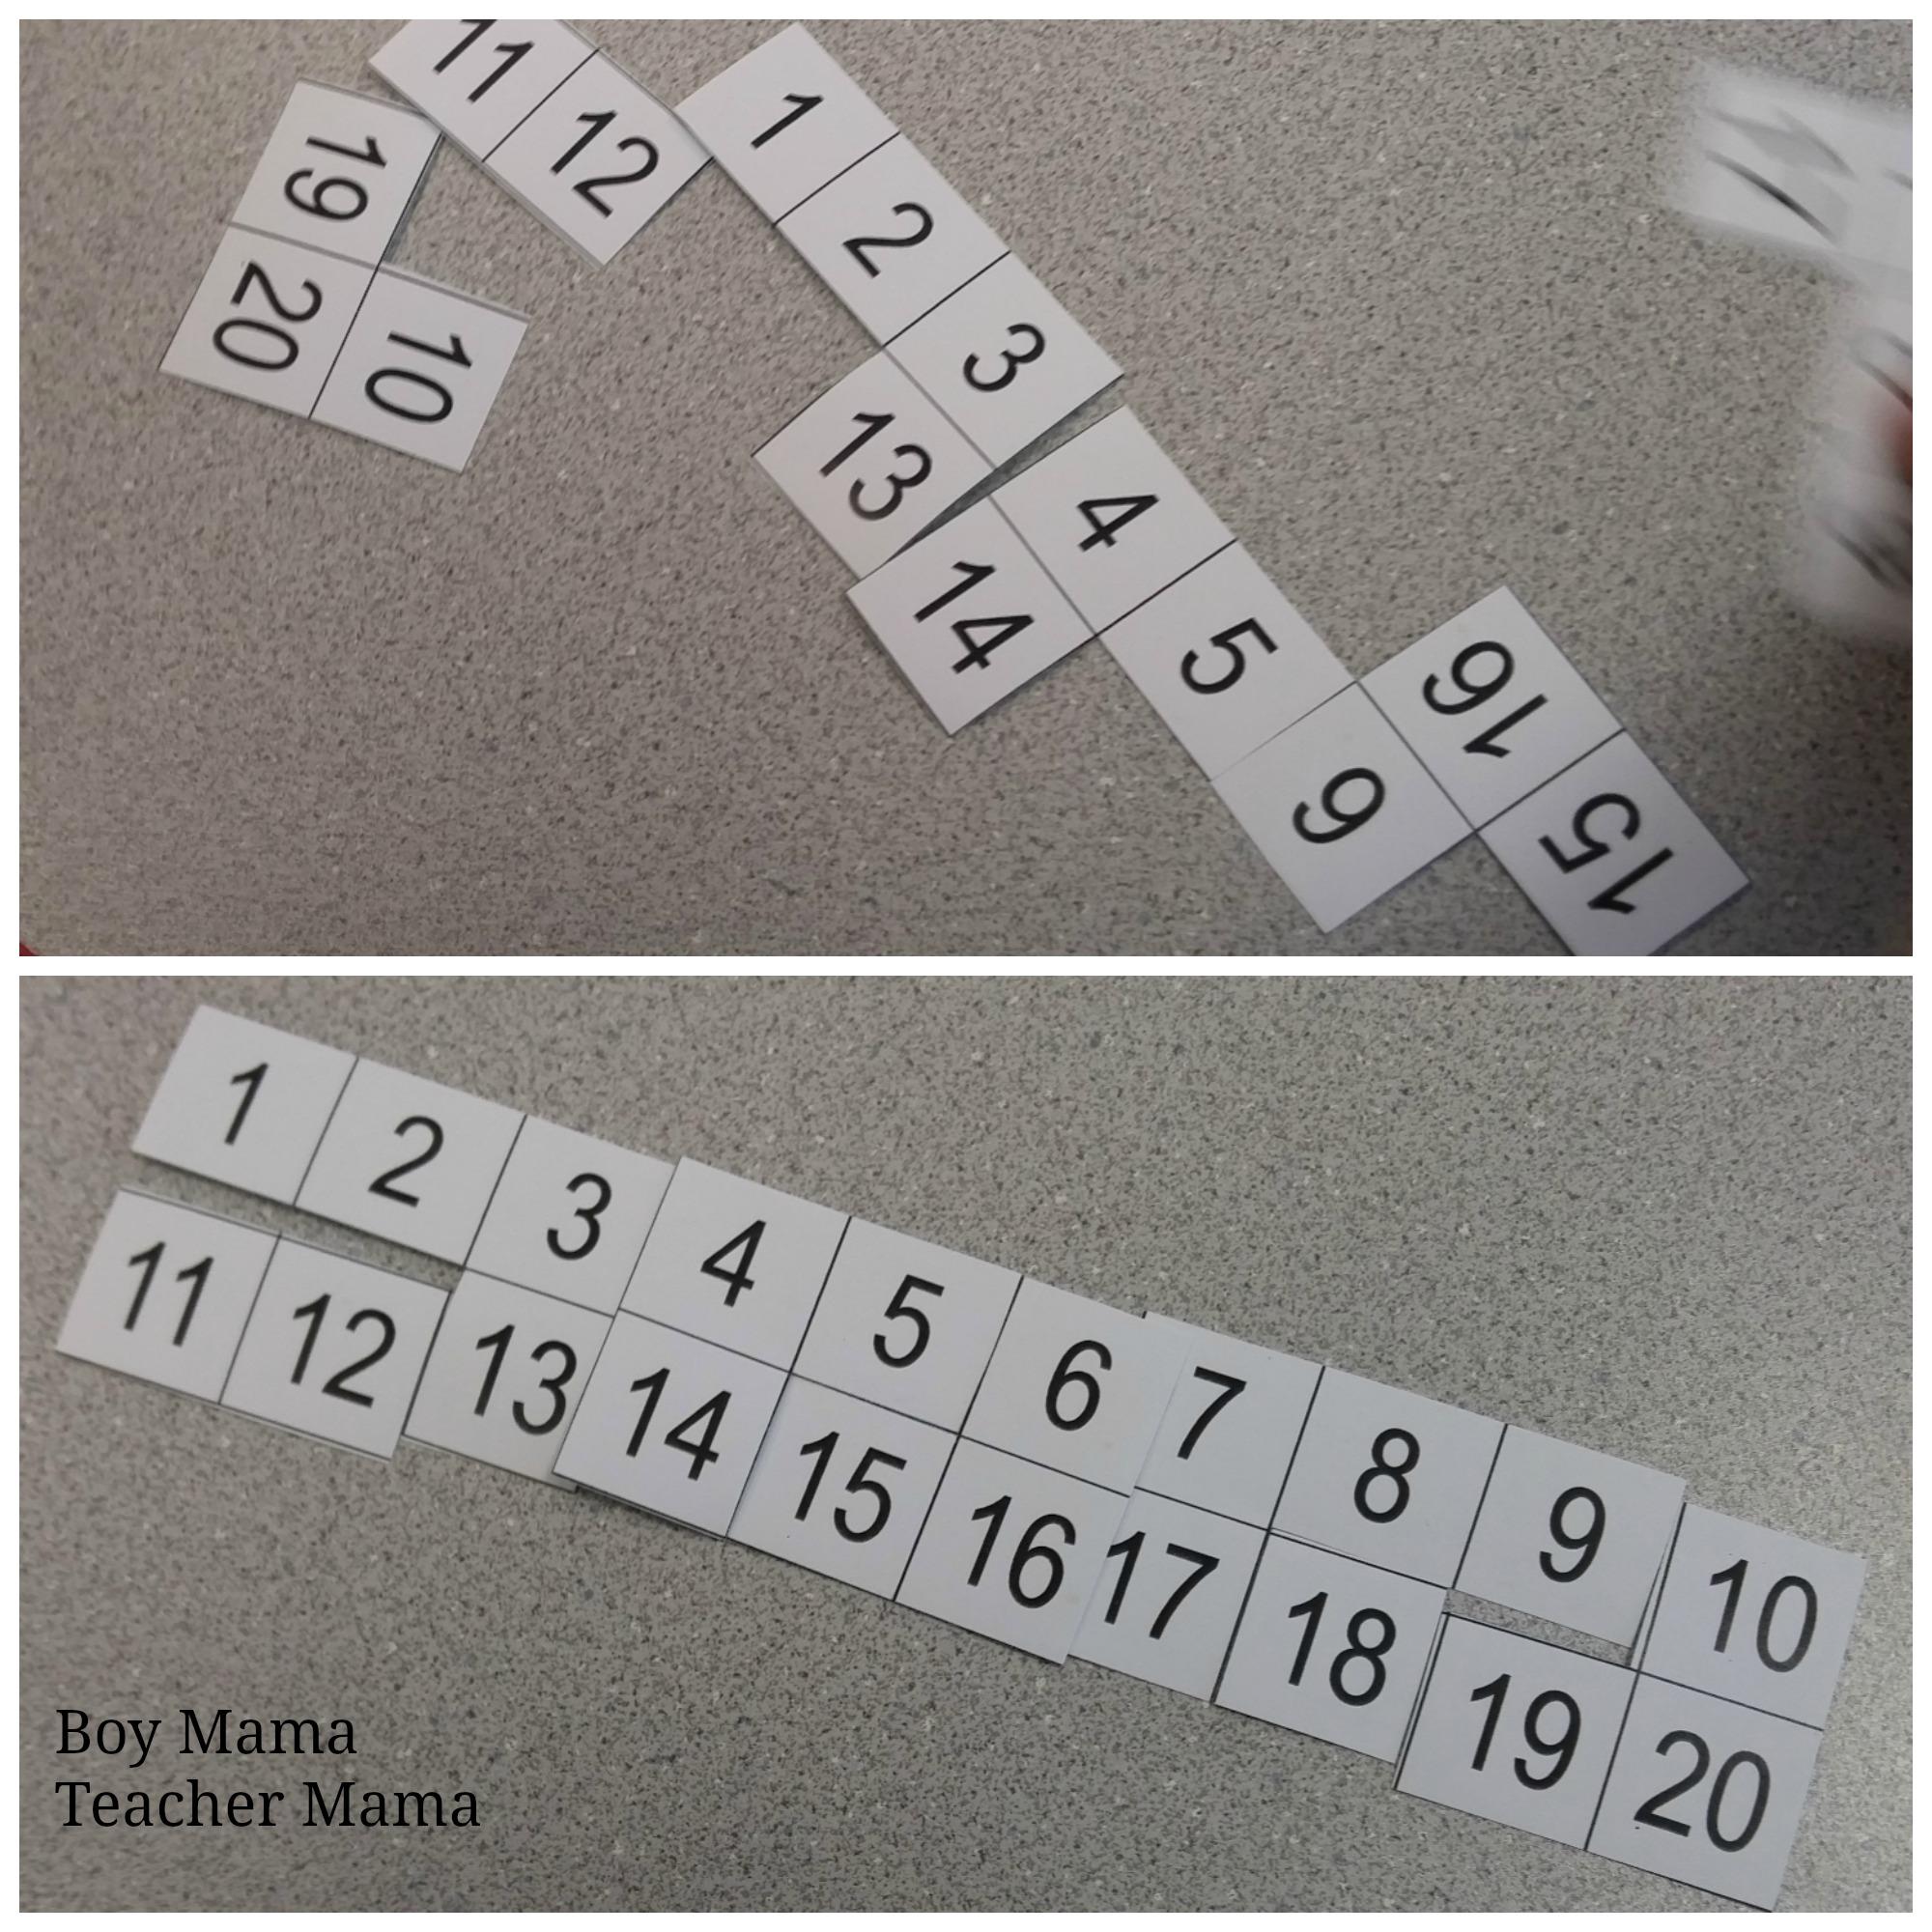 Boy Mama Teacher Mama 100s Chart Puzzles 4